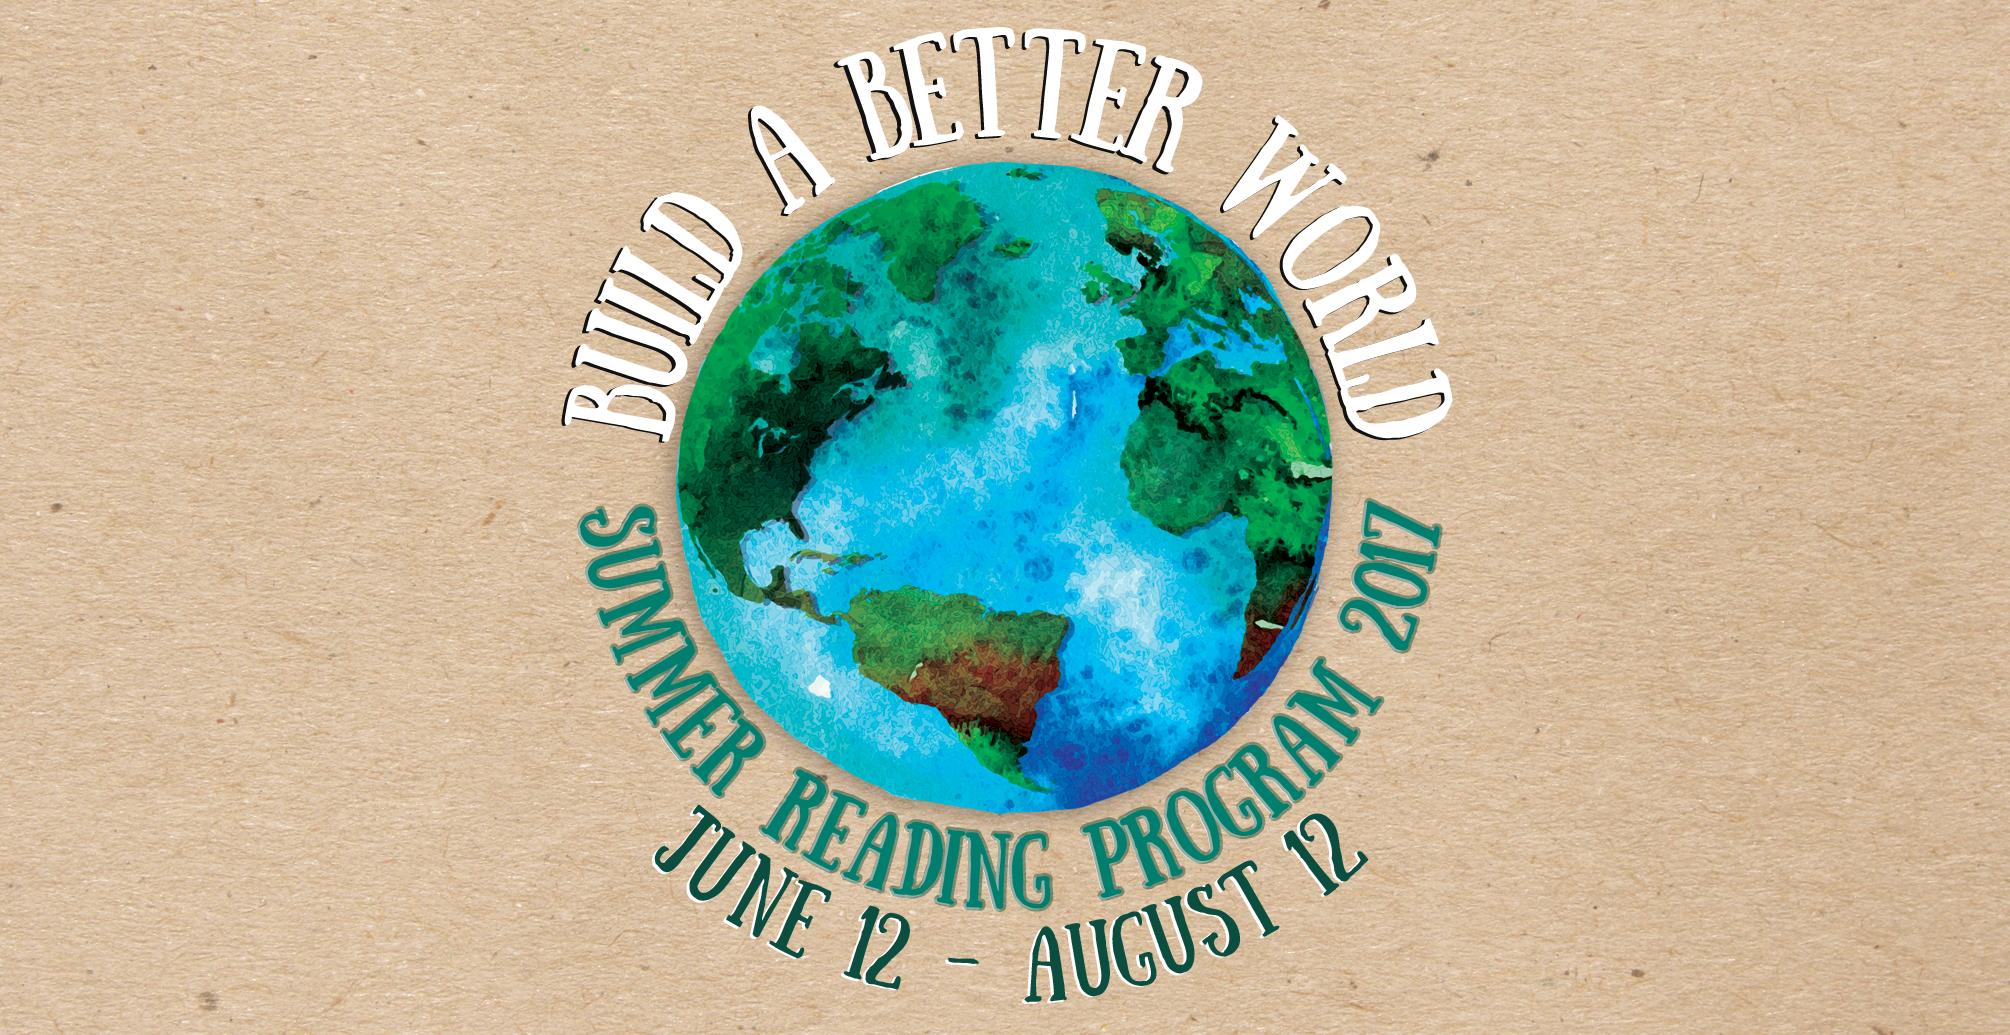 2017-06-LIBRARY-Milan-Summer-Reading-Program-Slide